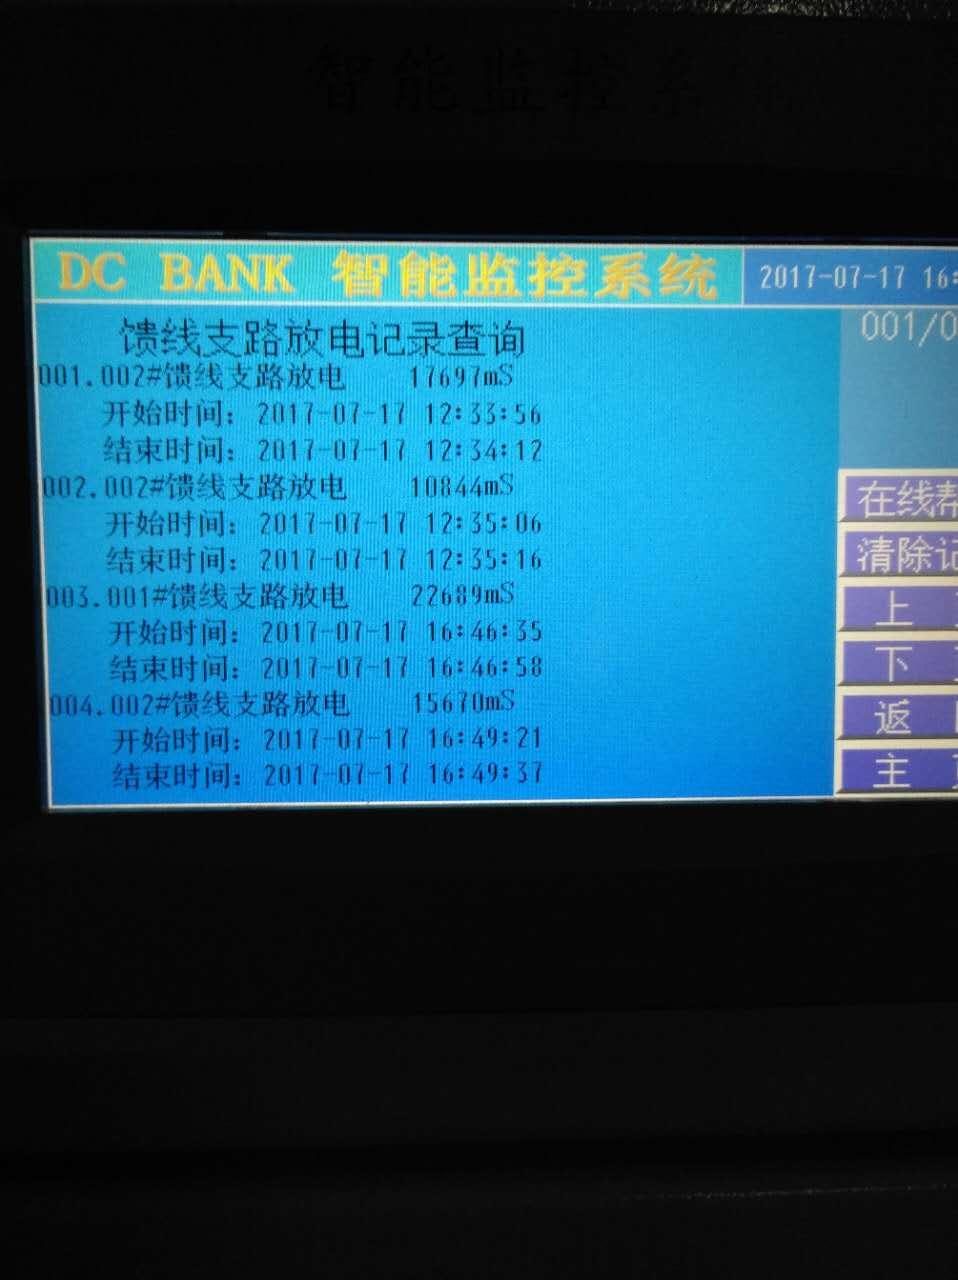 DC-BANK抗晃电系统,变频器直流支撑,动力不间断电源系统